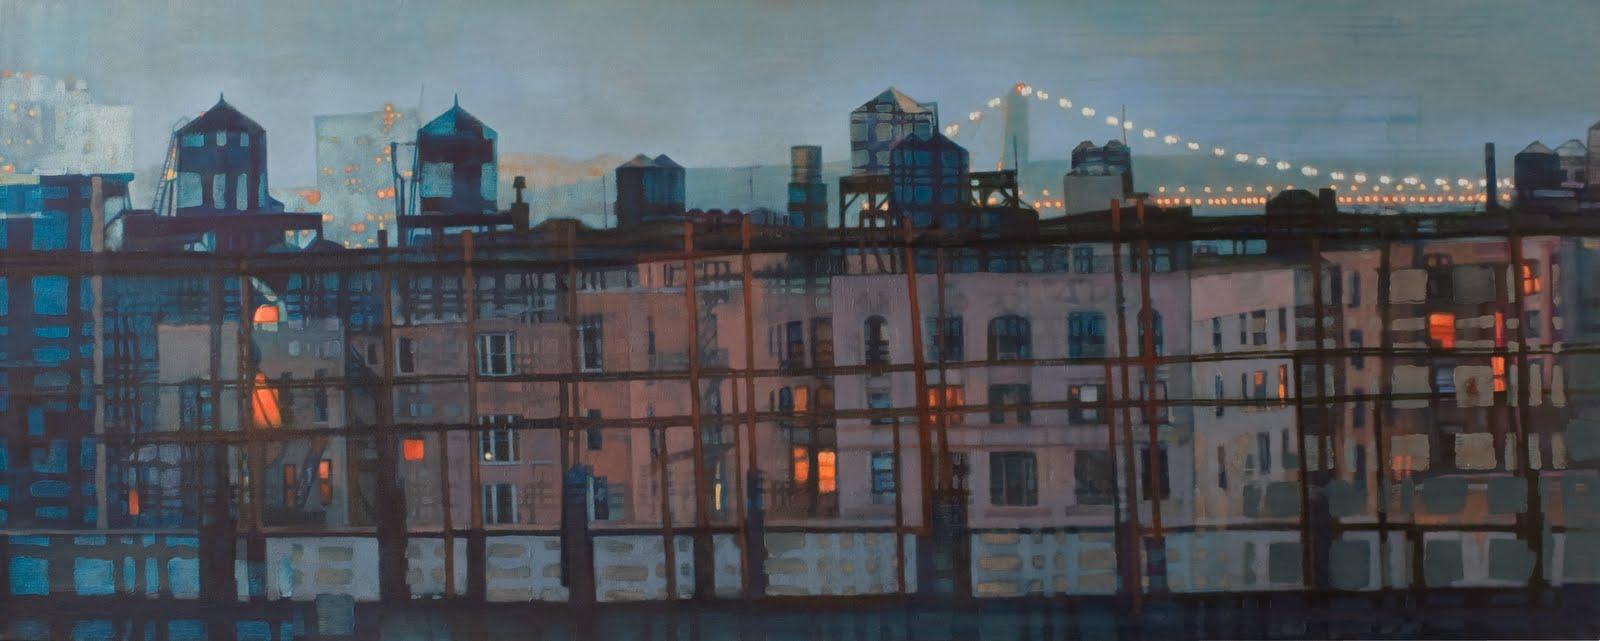 """Looking North (George Washington Bridge)"", oil on linen, 28 x 70 x 2.5 in."